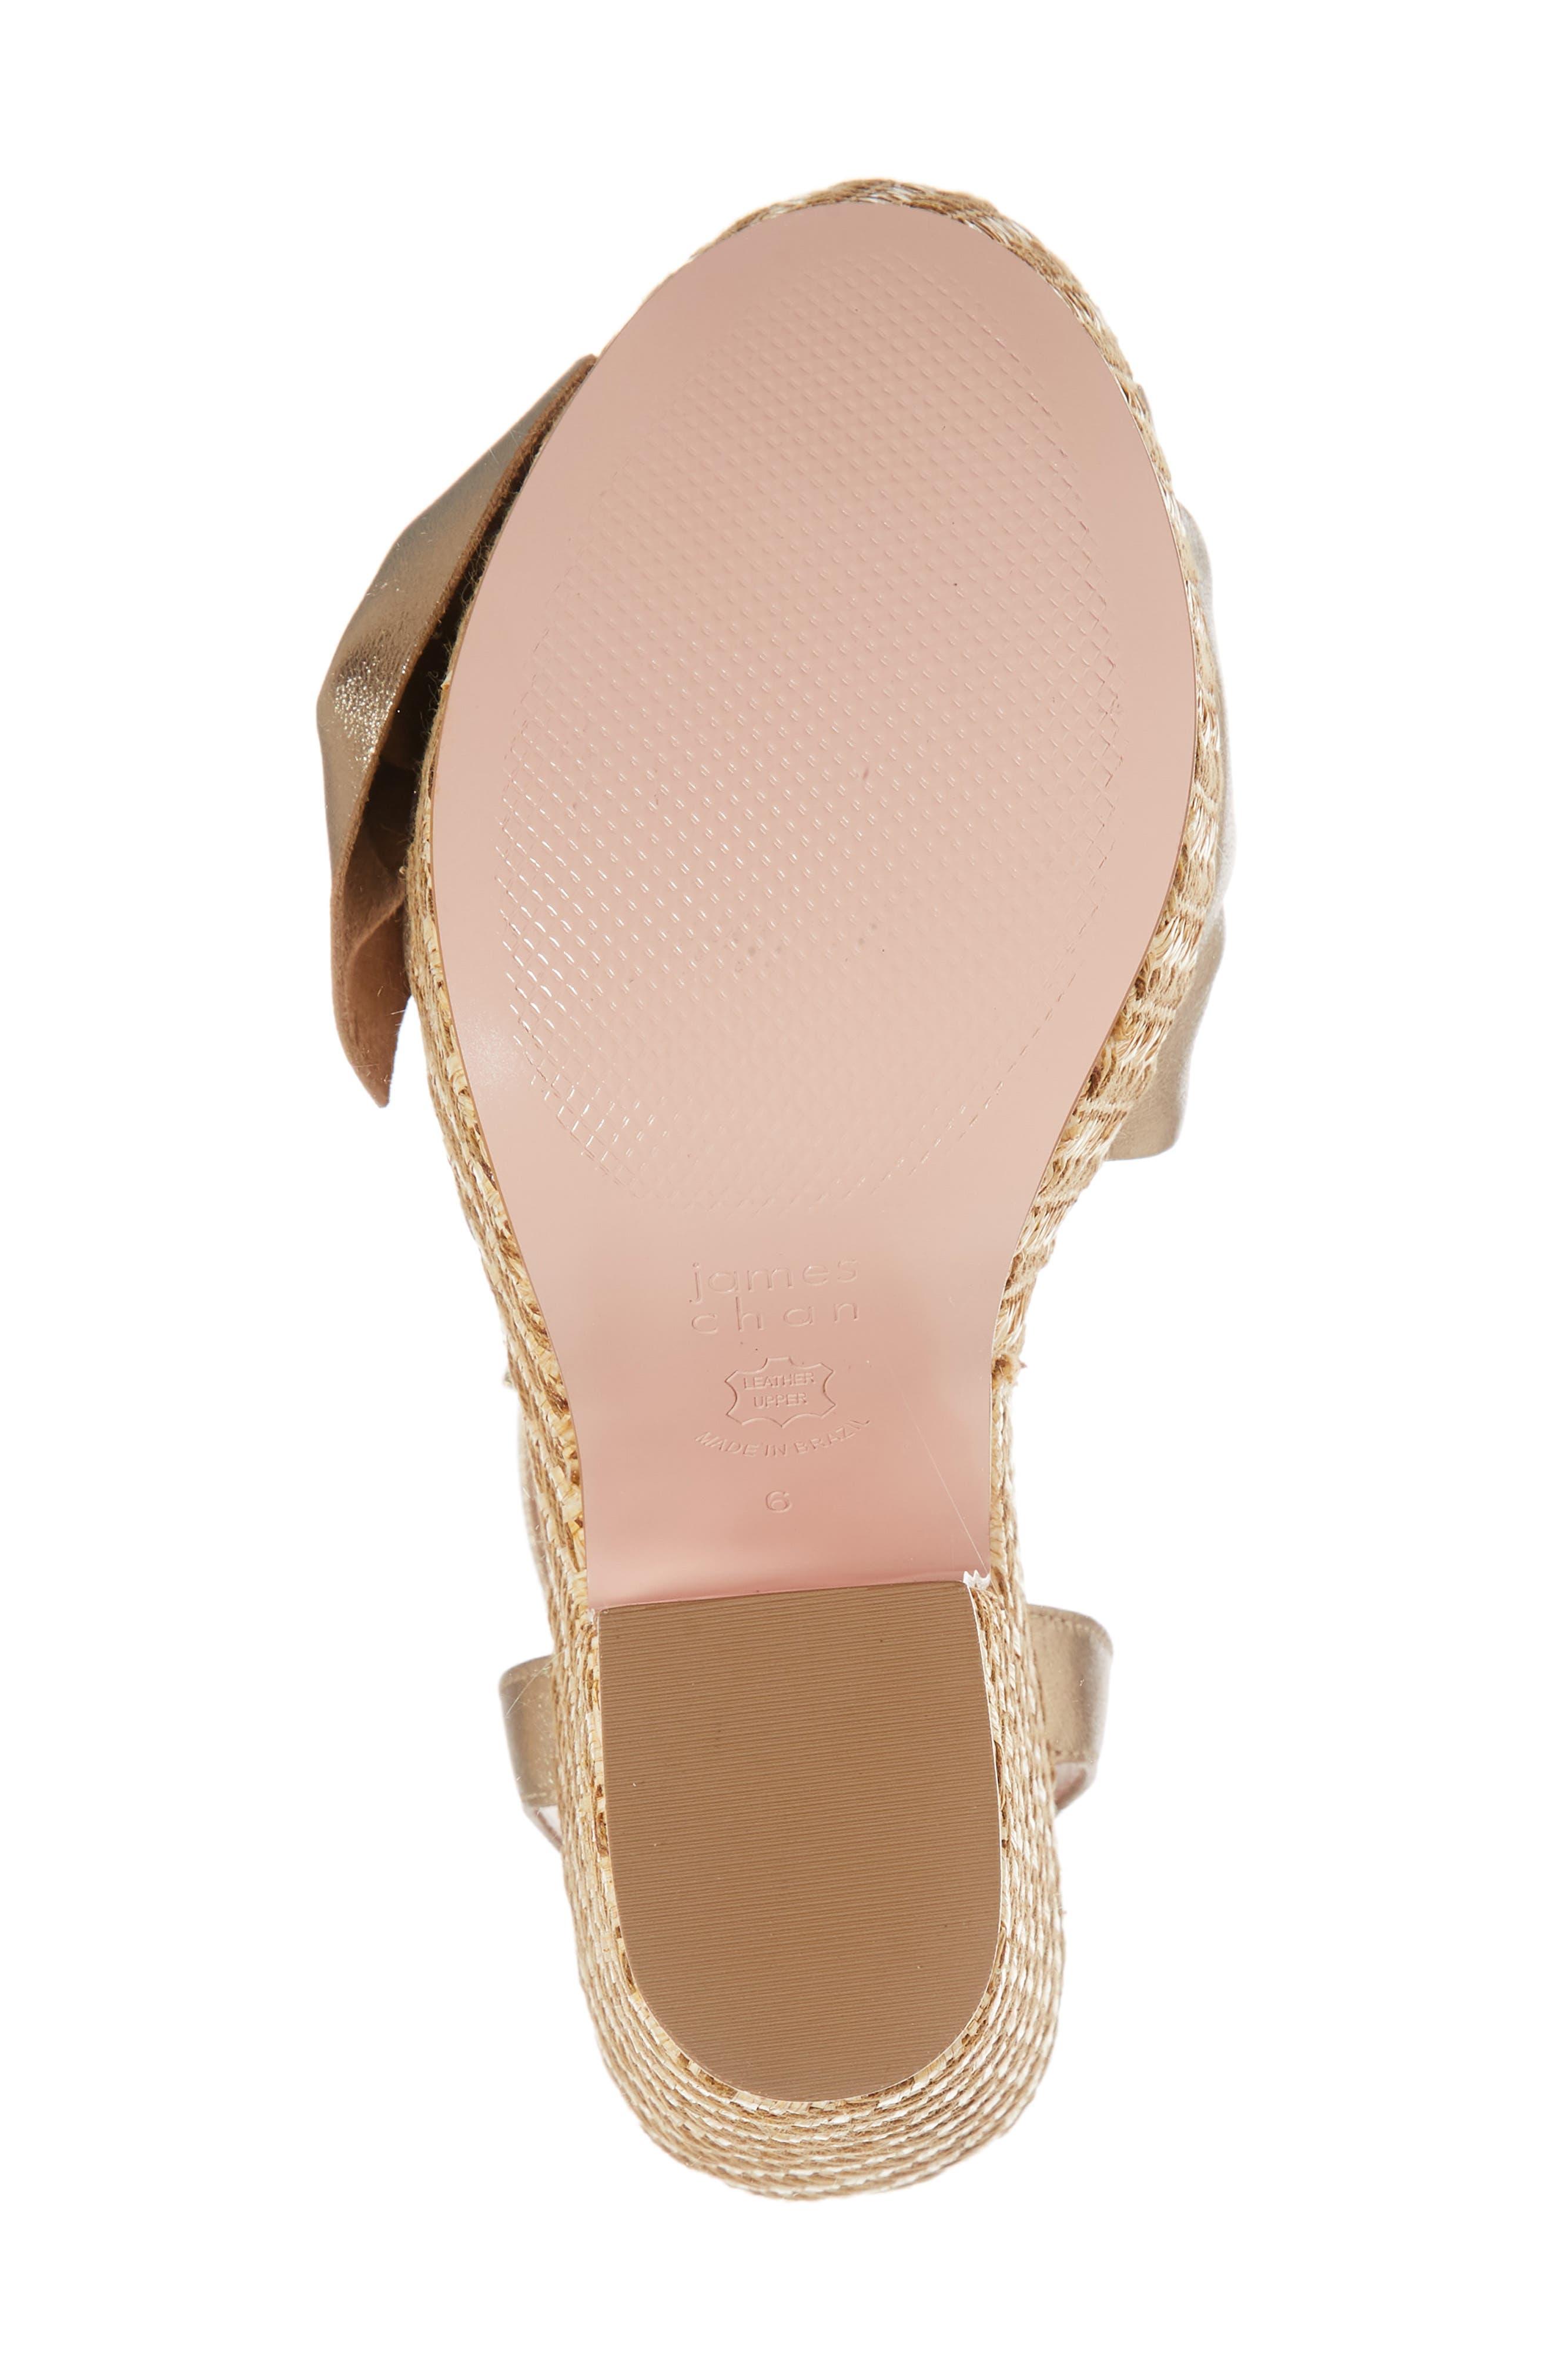 Pinky Platform Sandal,                             Alternate thumbnail 6, color,                             Dark Gold Suede